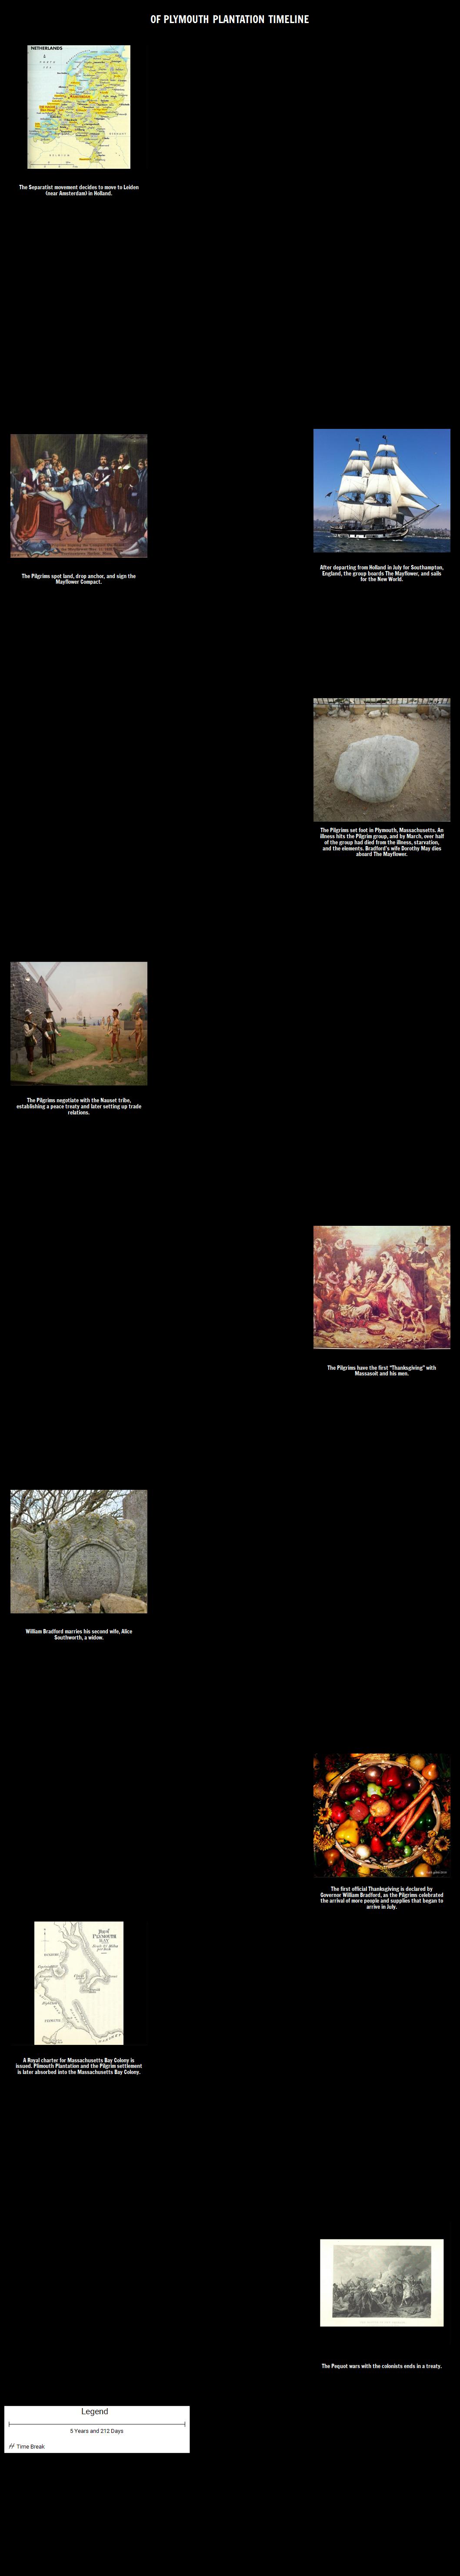 Pilgrims clipart mayflower compact. Essay